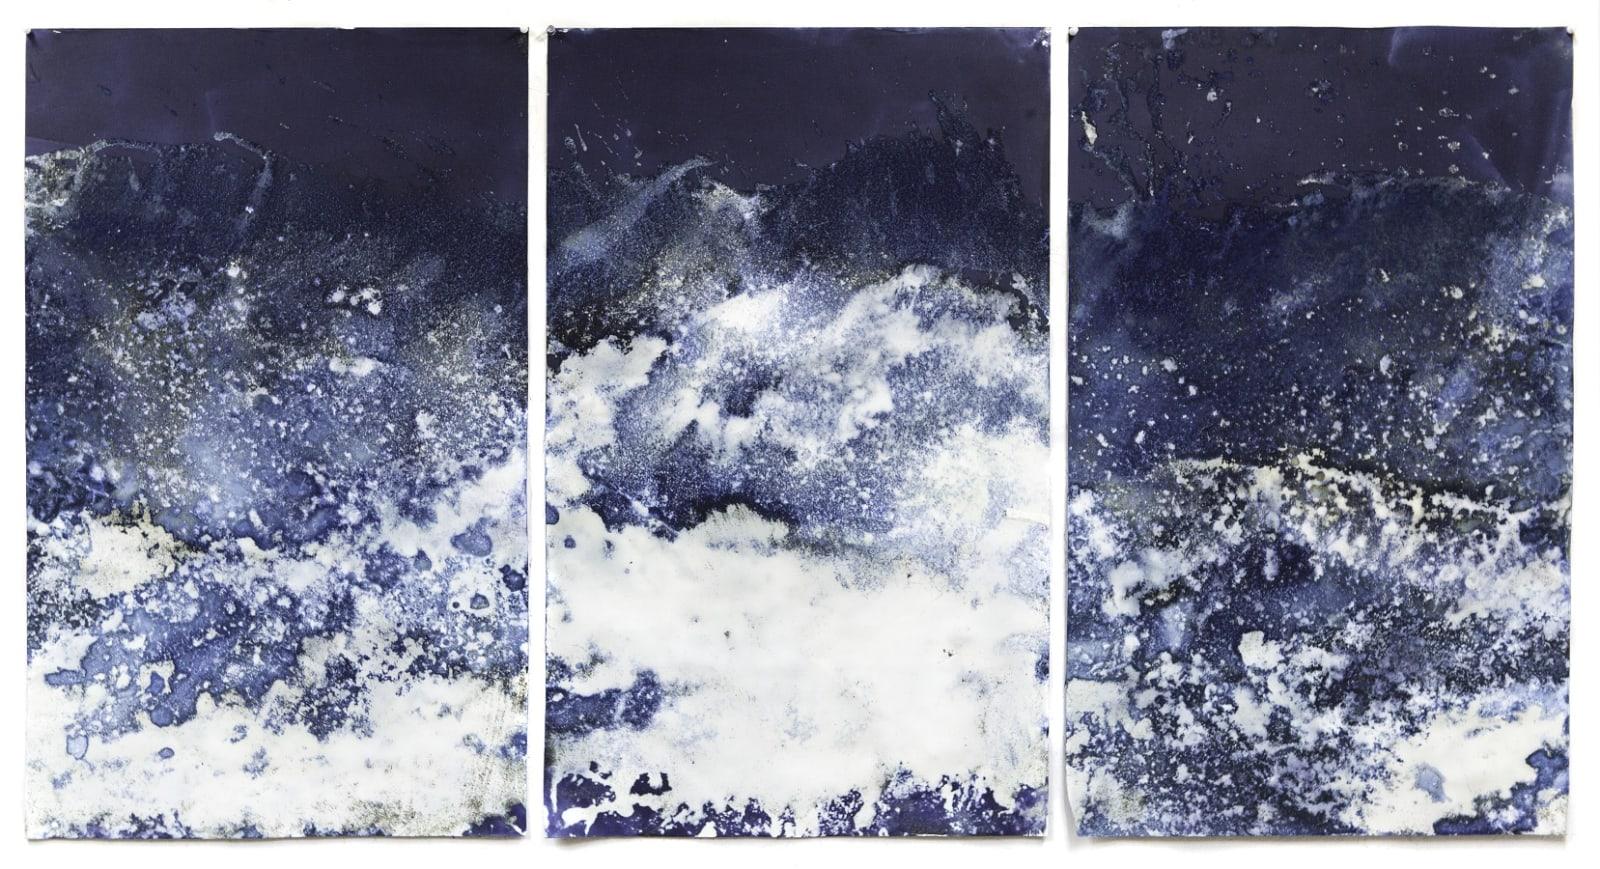 Meghann Riepenhoff 梅根·瑞普霍夫, Littoral Drift #200 (Recto, Fay Bainbridge Beach, WA 02.02.15, Two Waves, Poured and Buried), 2015